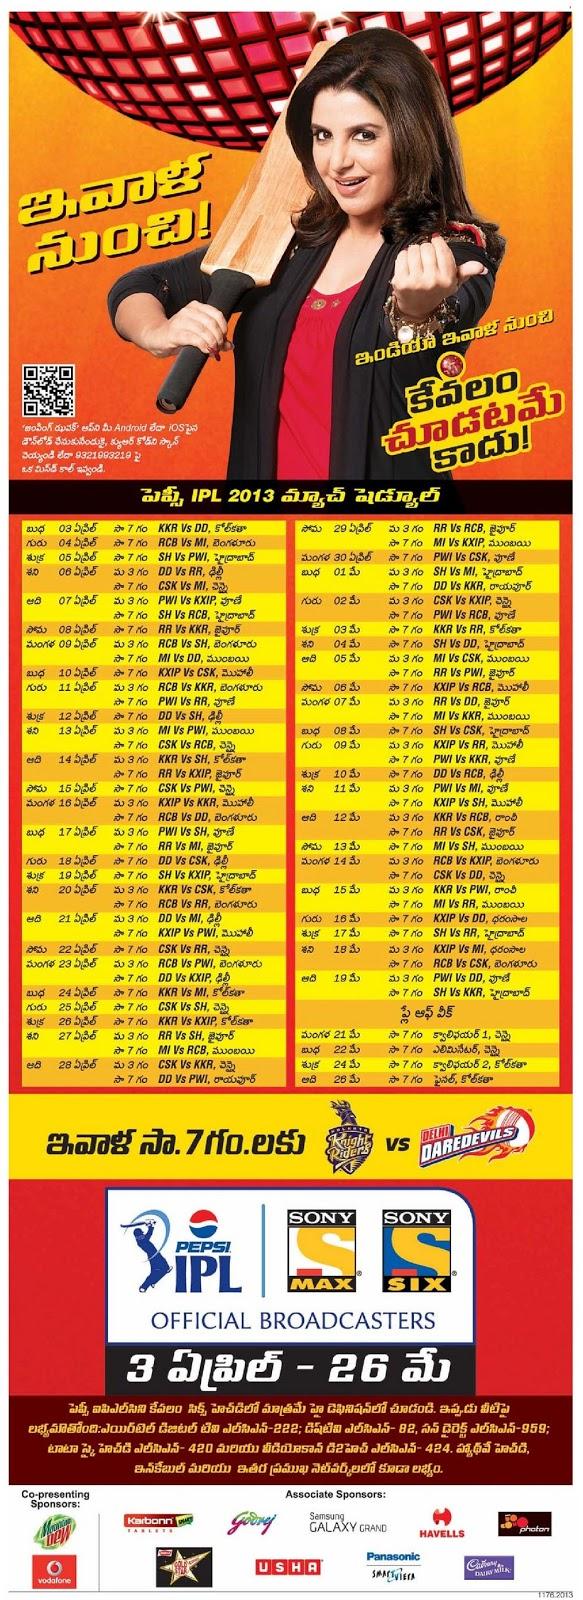 IPL 2013 SEASON SCHEDULE